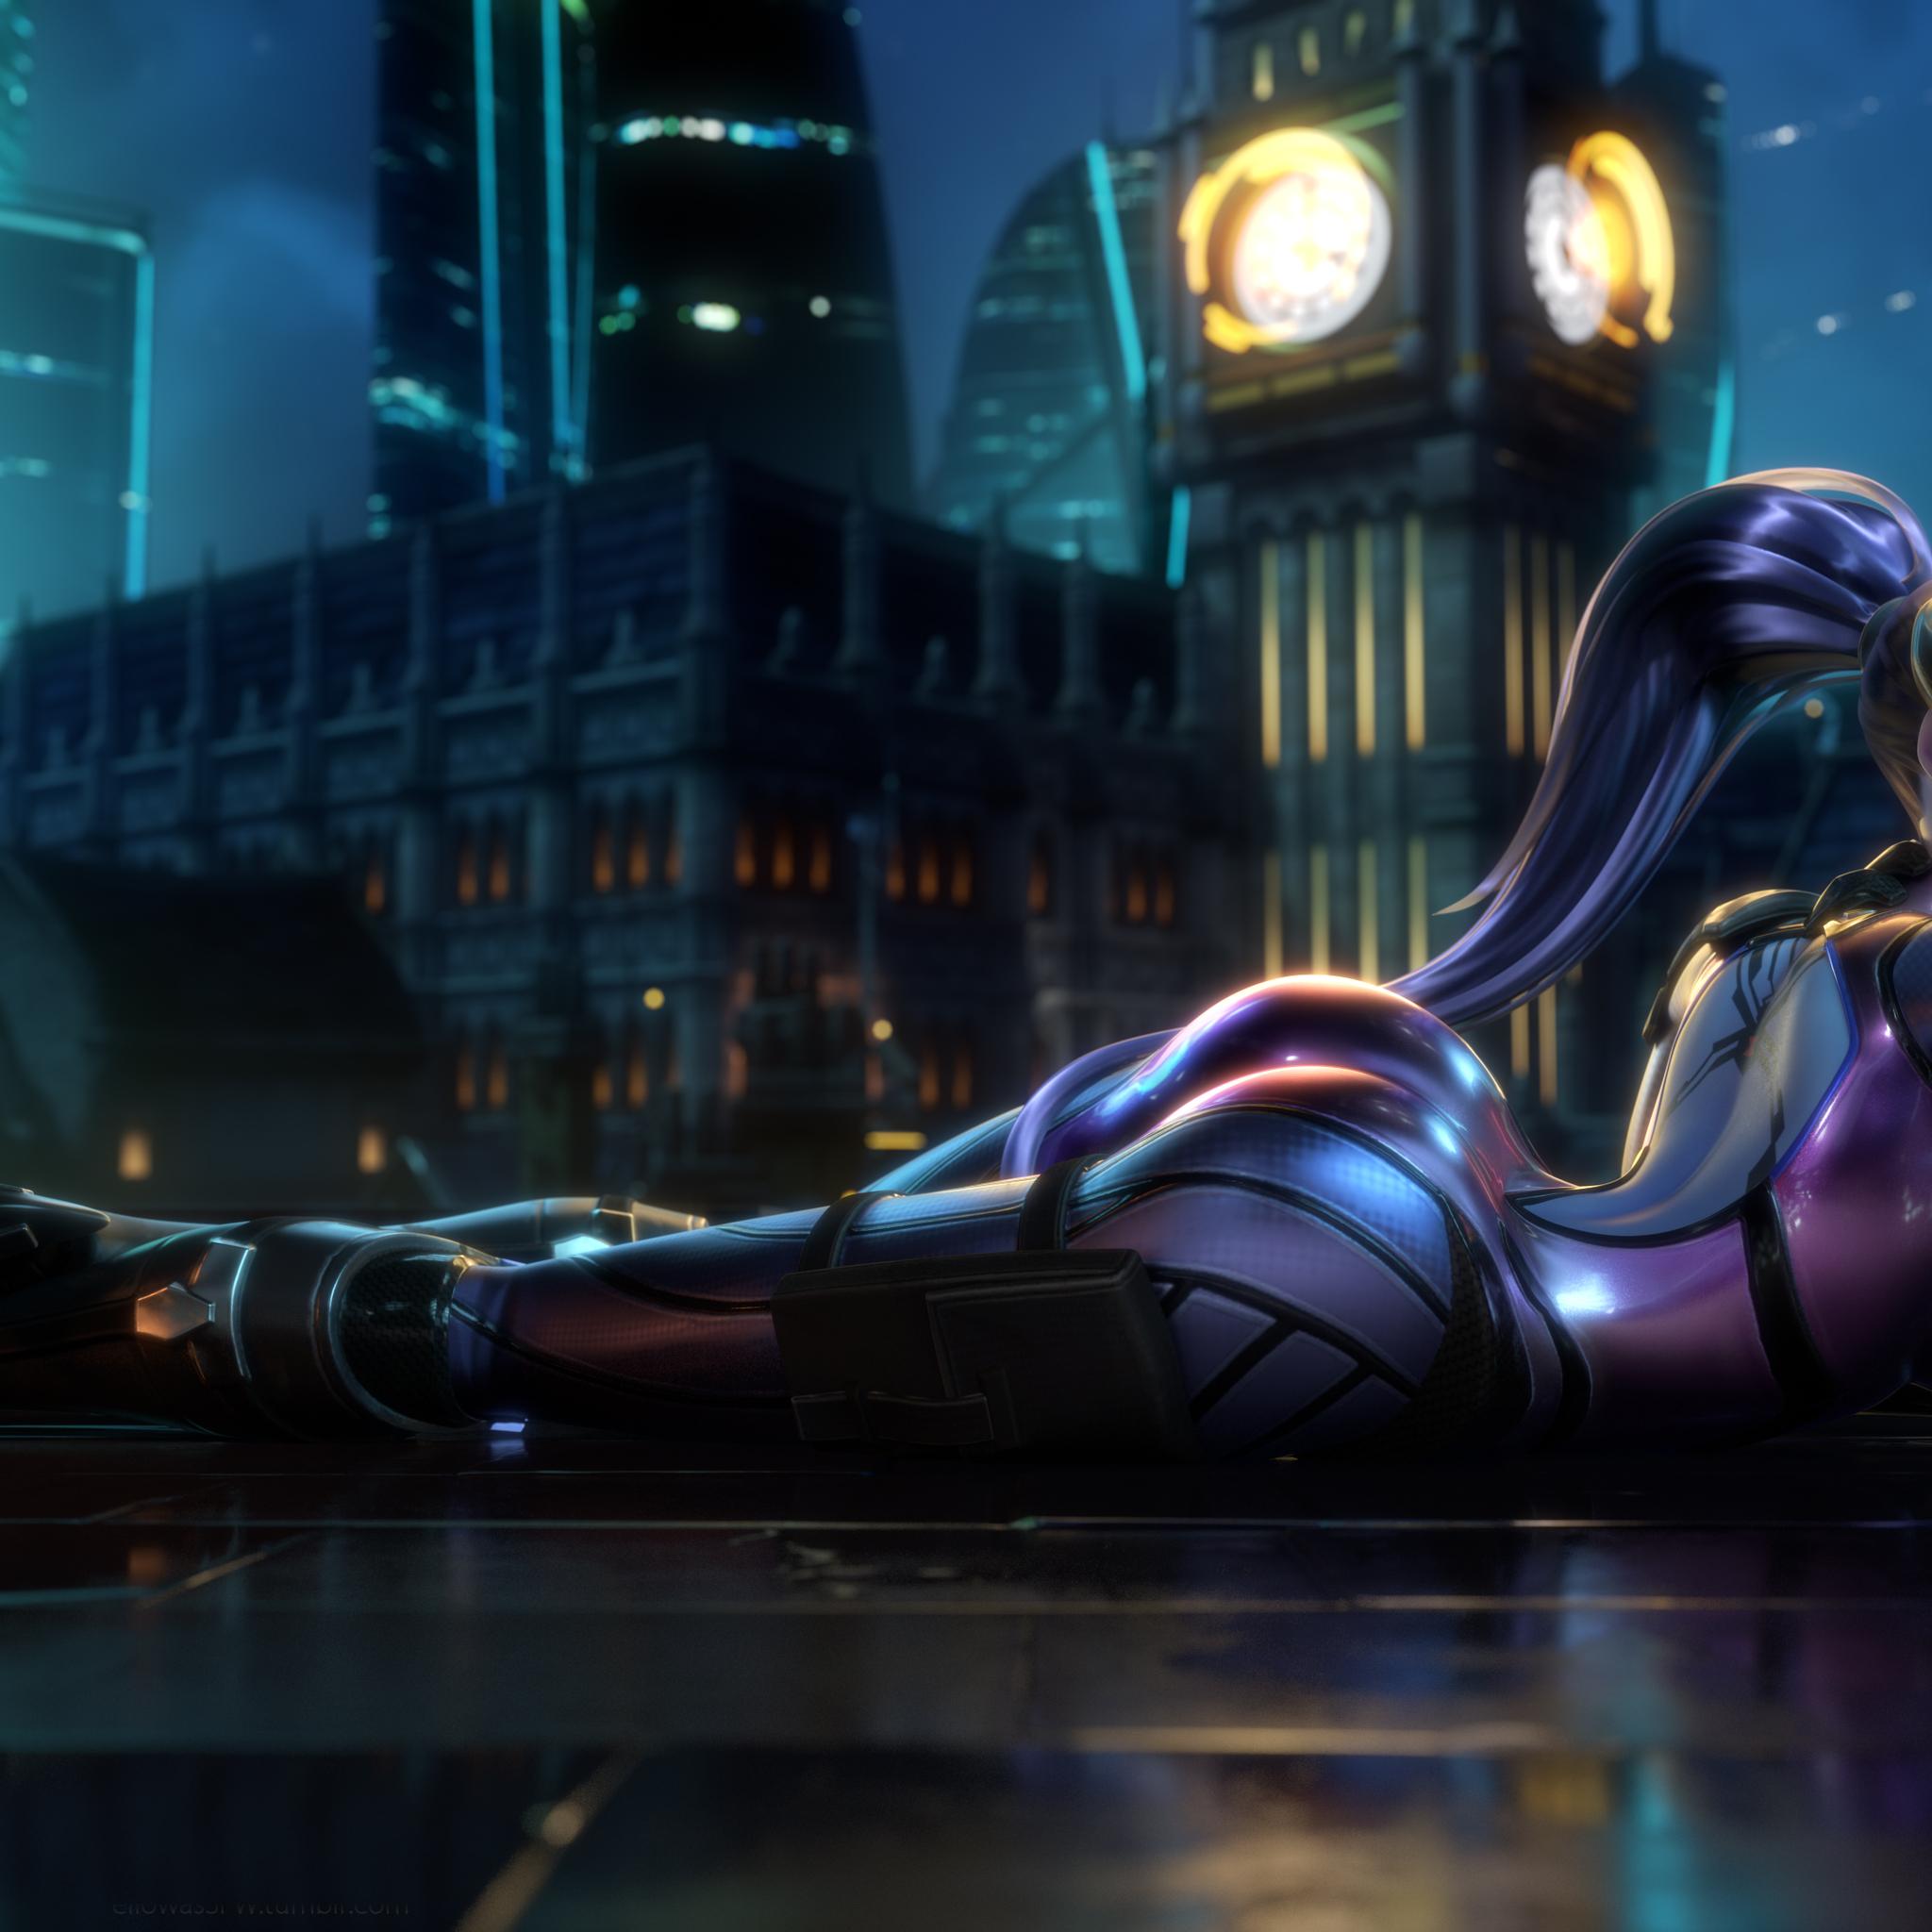 widowmaker-overwatch-art-ad.jpg